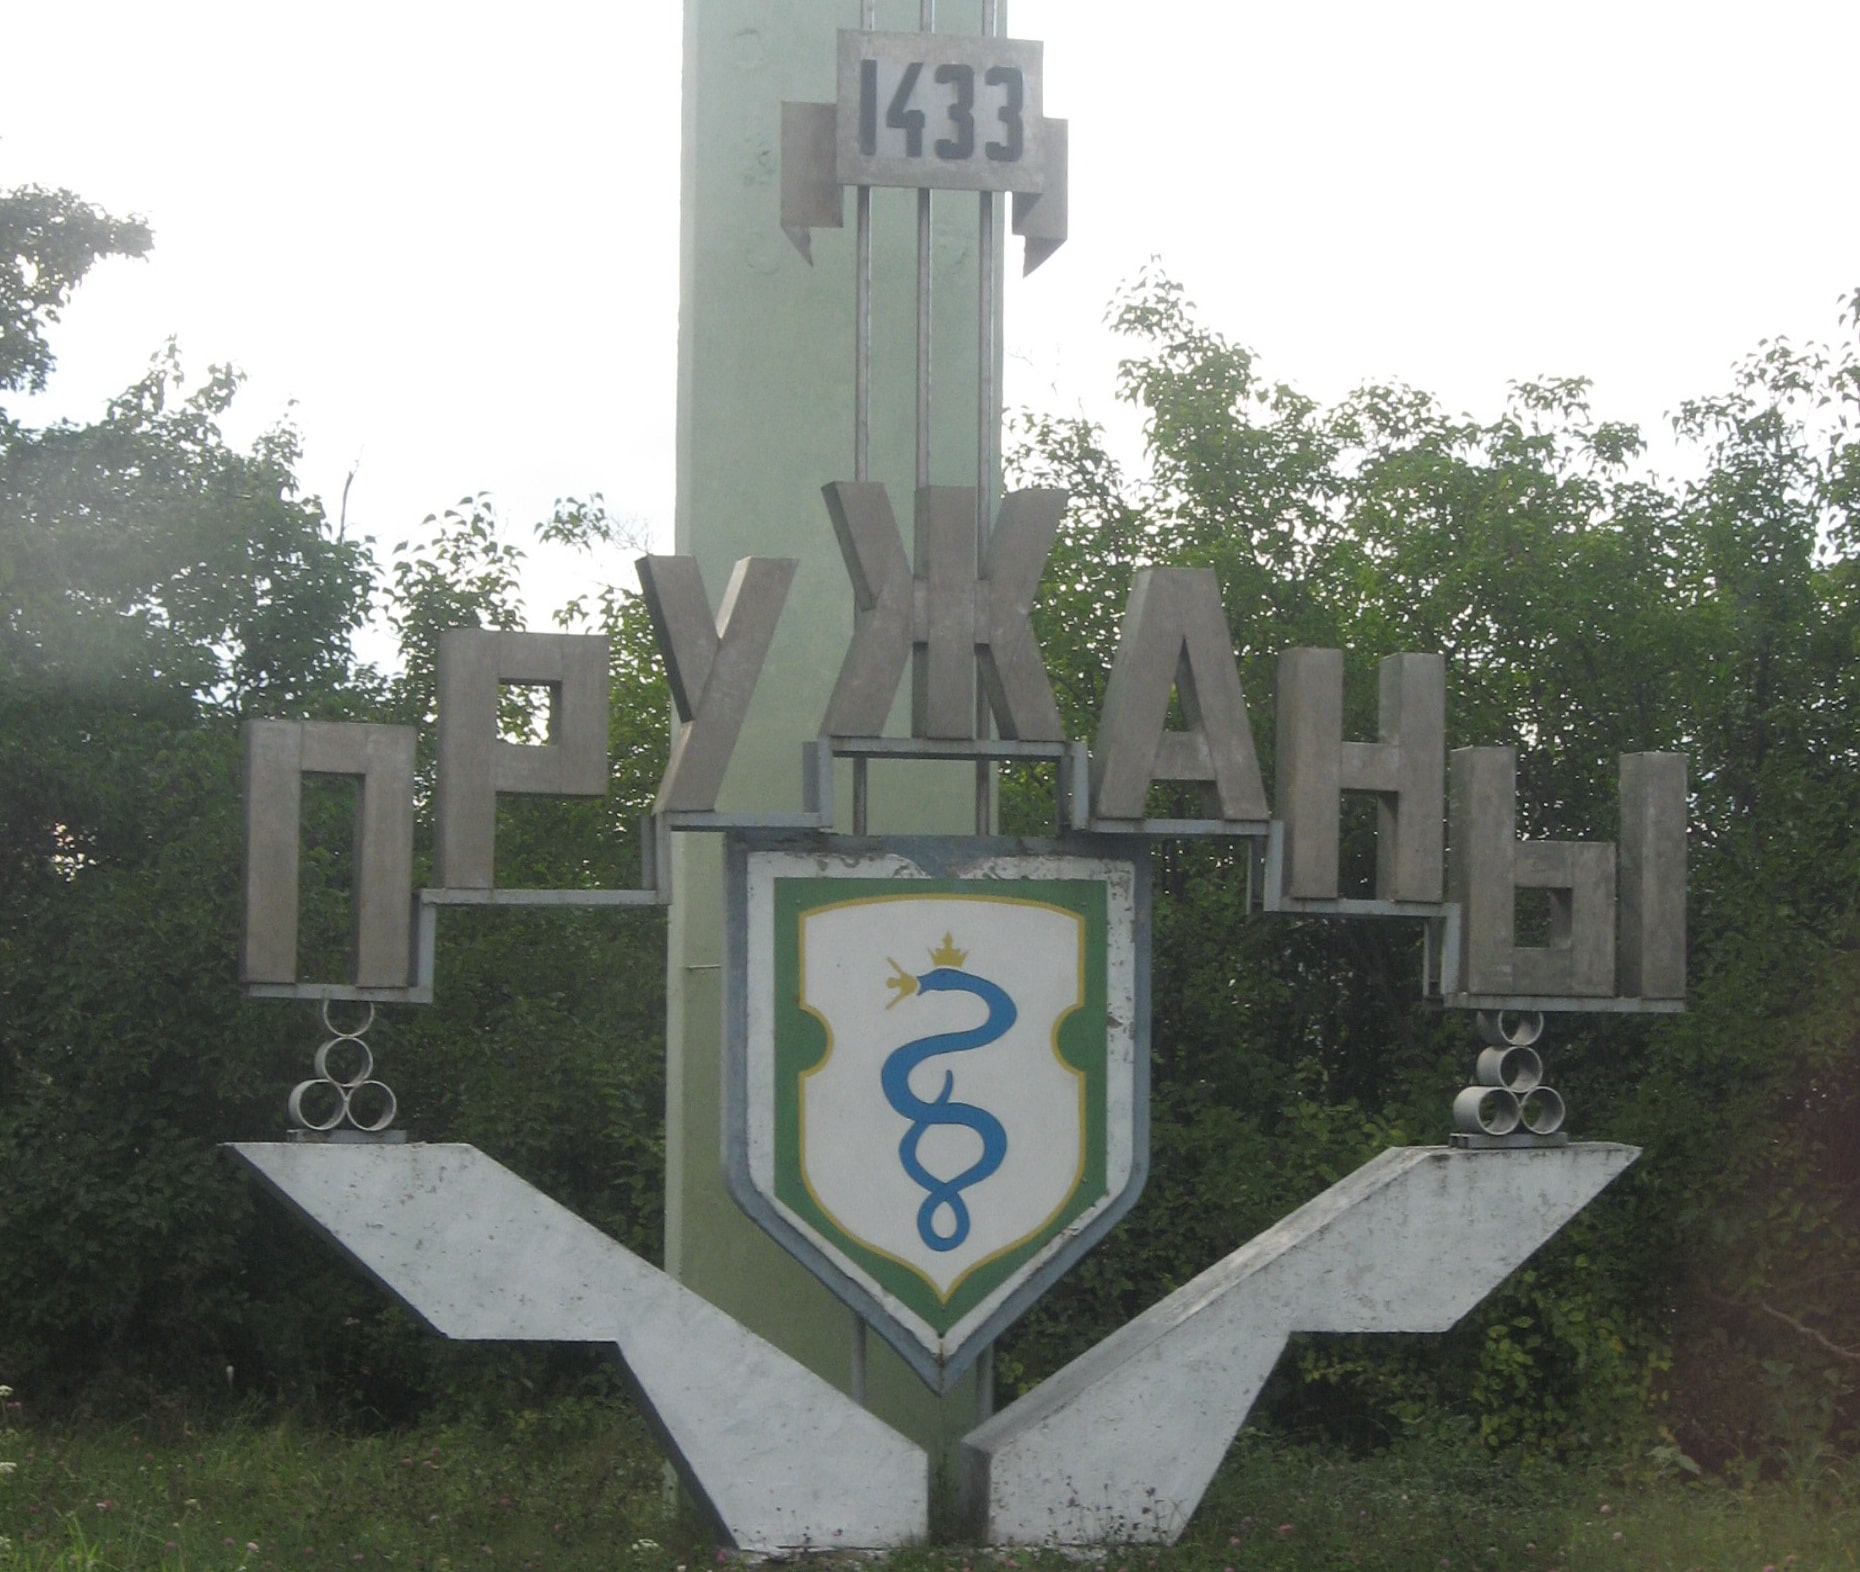 Герб Пружан на въездном знаке